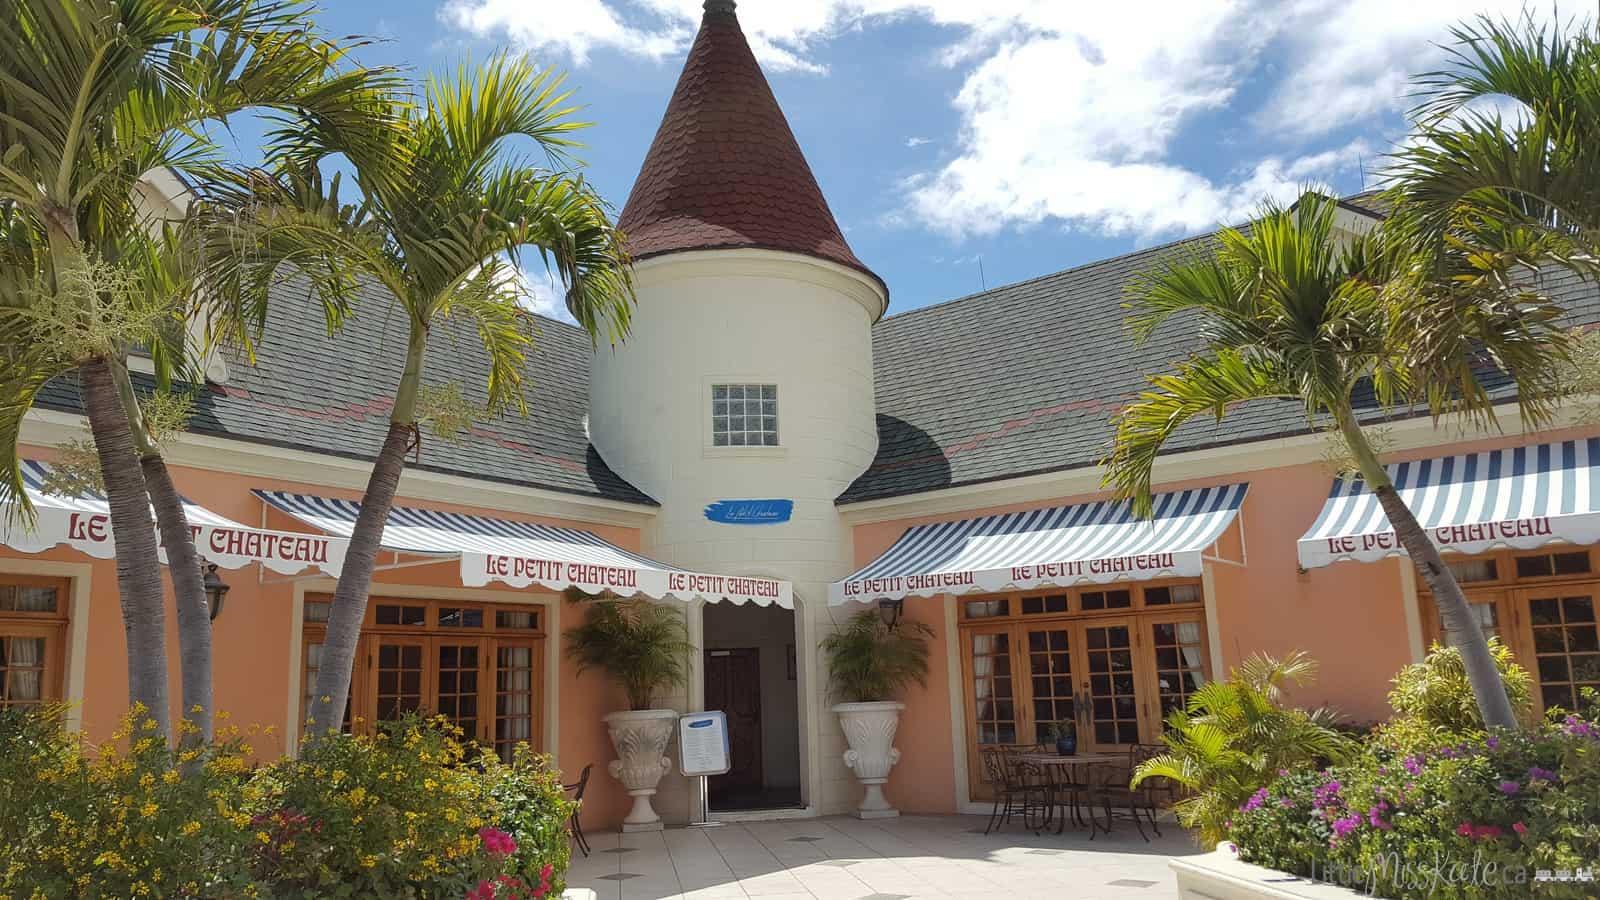 Beaches Resort Villages Turks and Caicos Restaurants - Le Petit Chateau via littlemisskate.ca